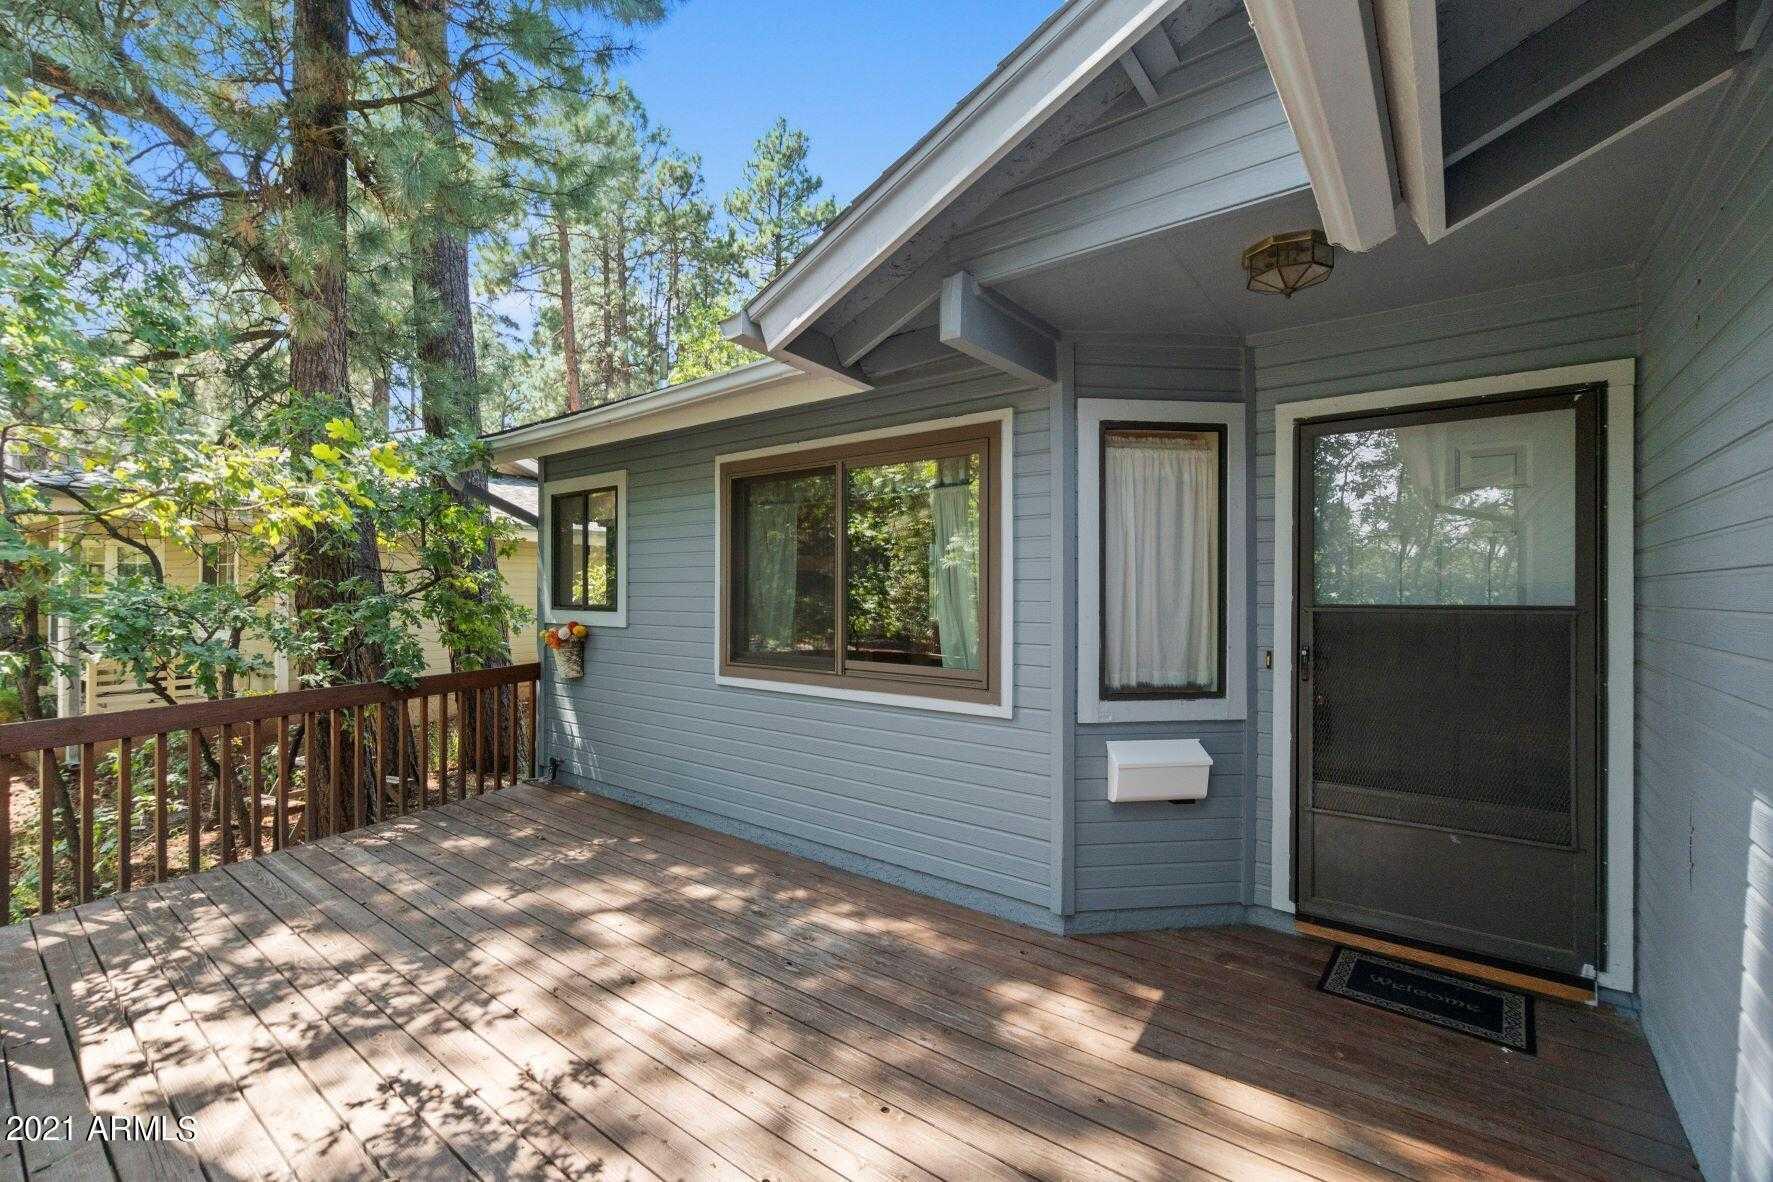 $505,000 - 3Br/2Ba - Home for Sale in University Highlands Unit 1, Flagstaff